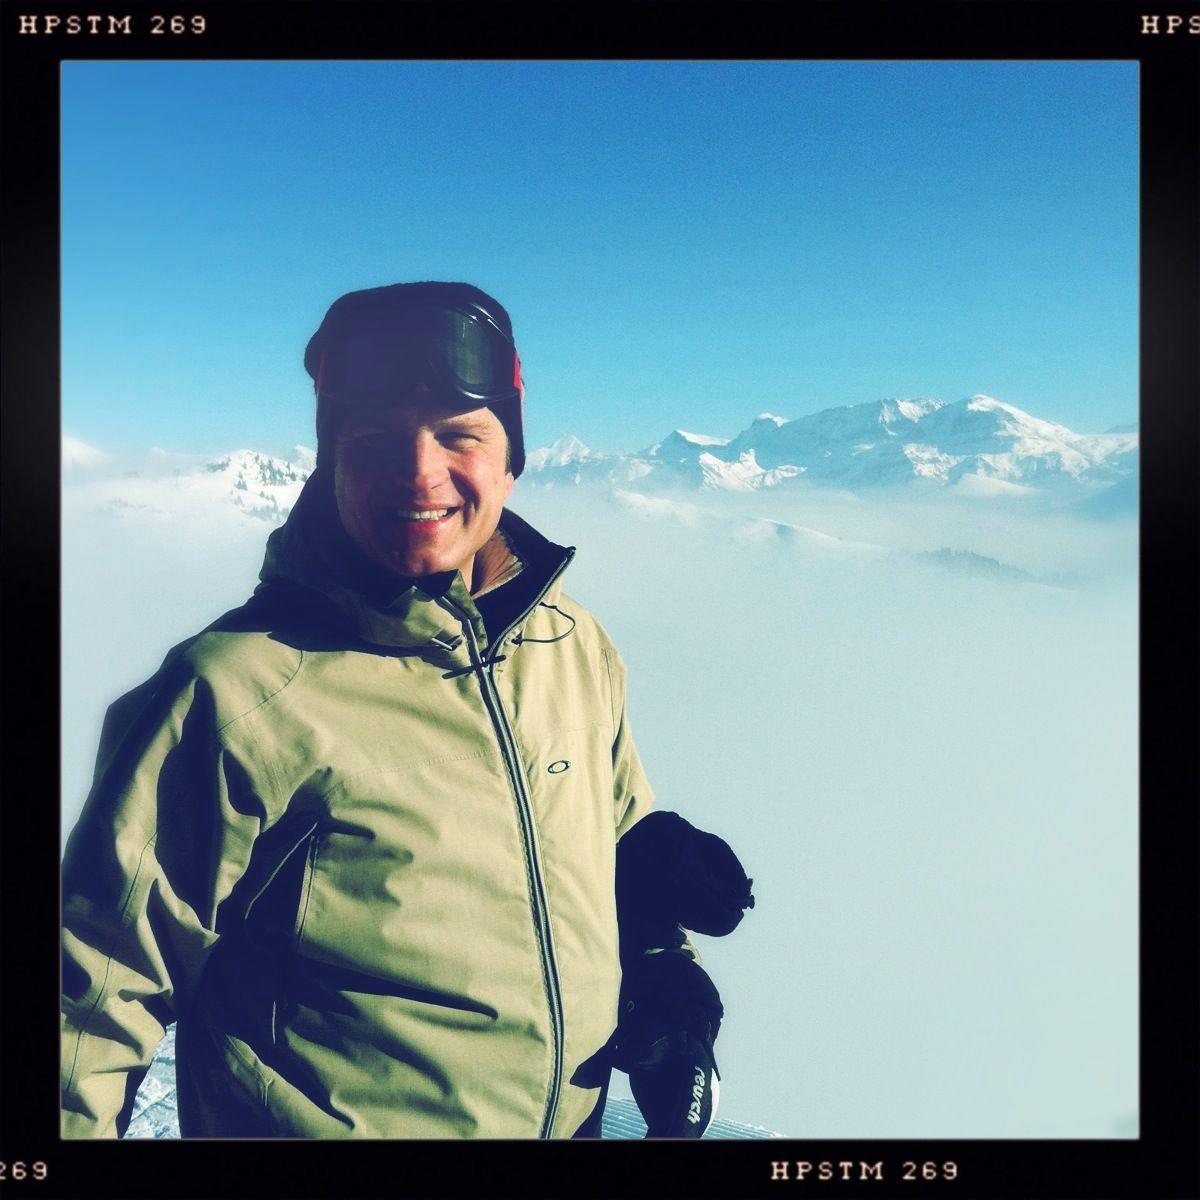 Wintersport in Gastaad14